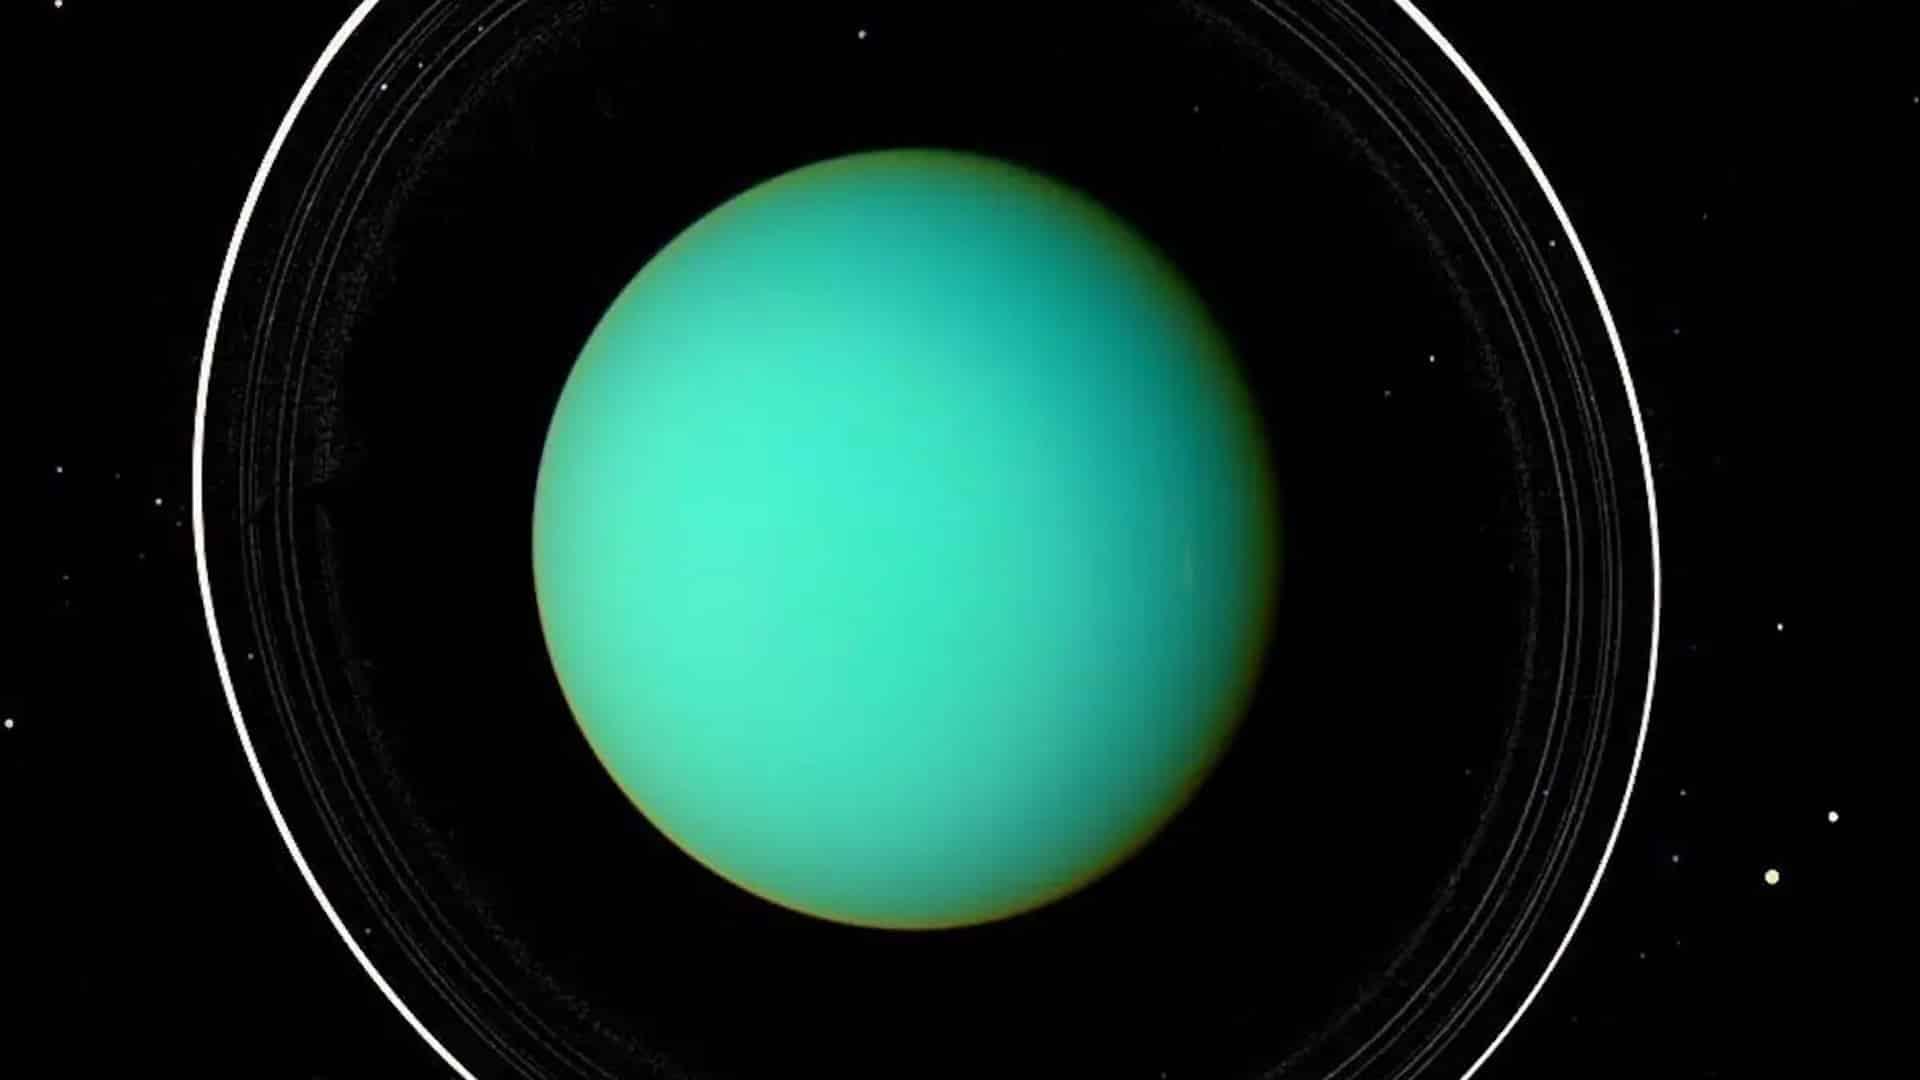 uran prstence fotografia